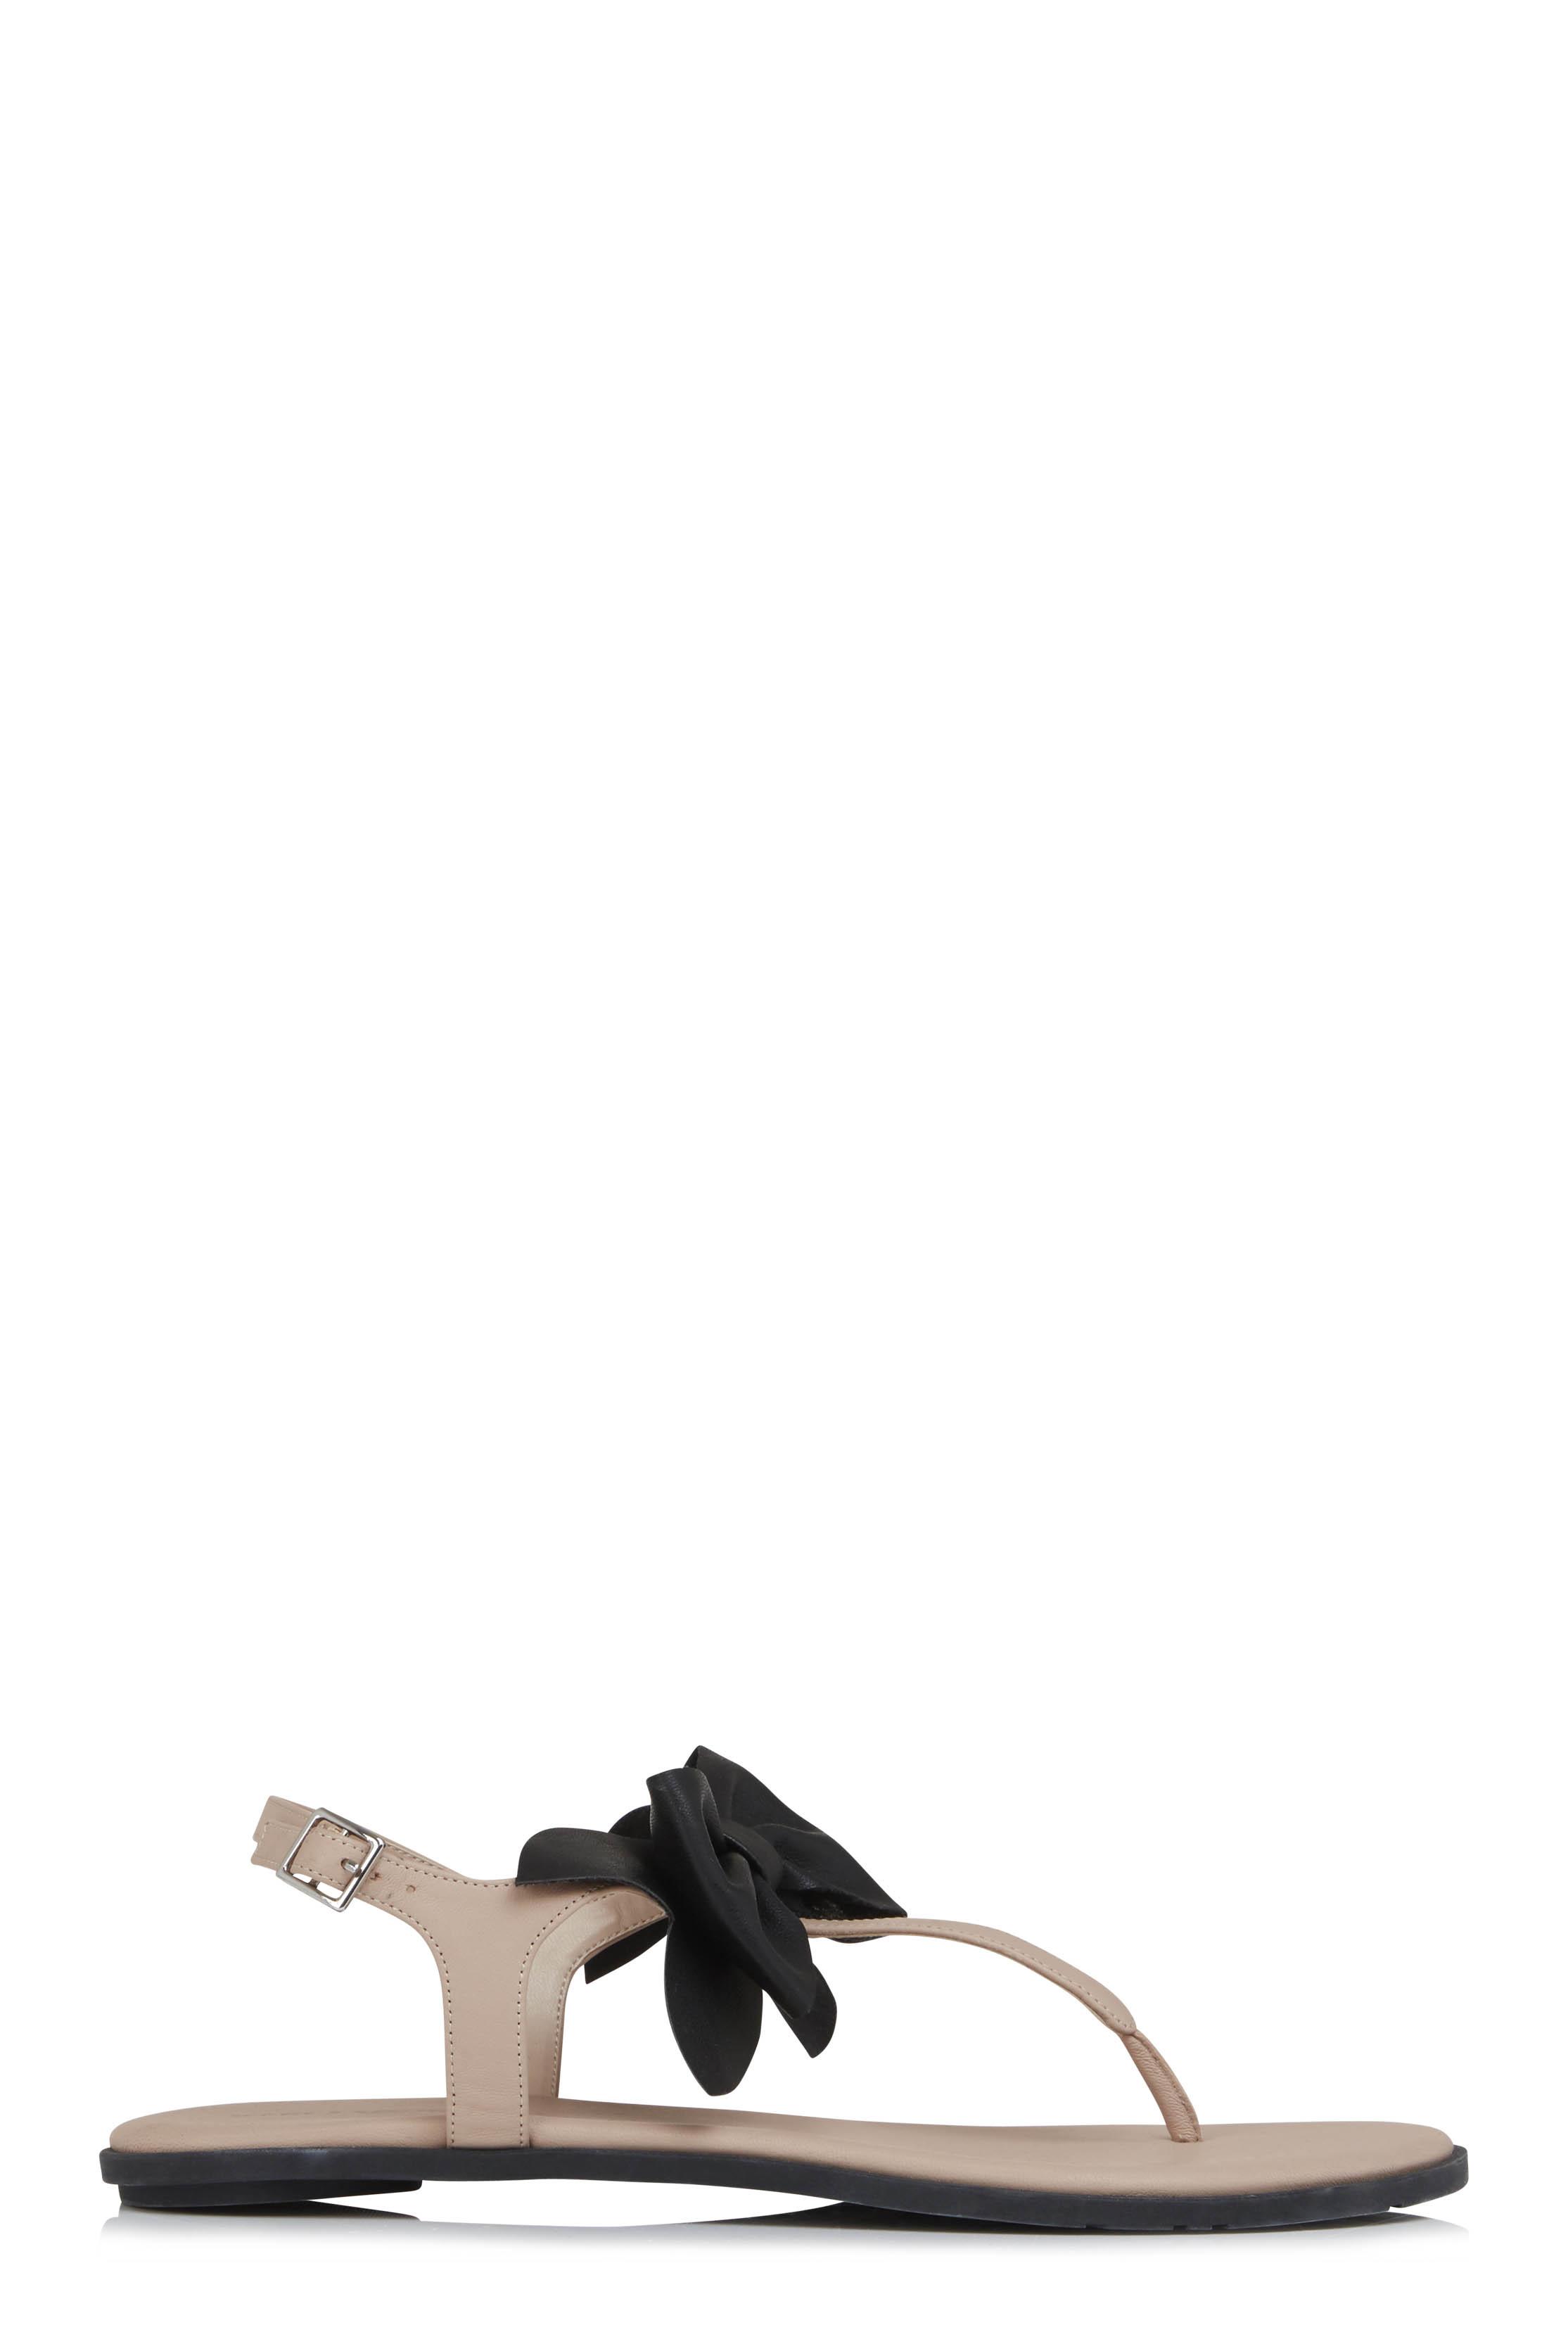 Karl Lagerfeld Paris Goldie Bow Flat Sandals